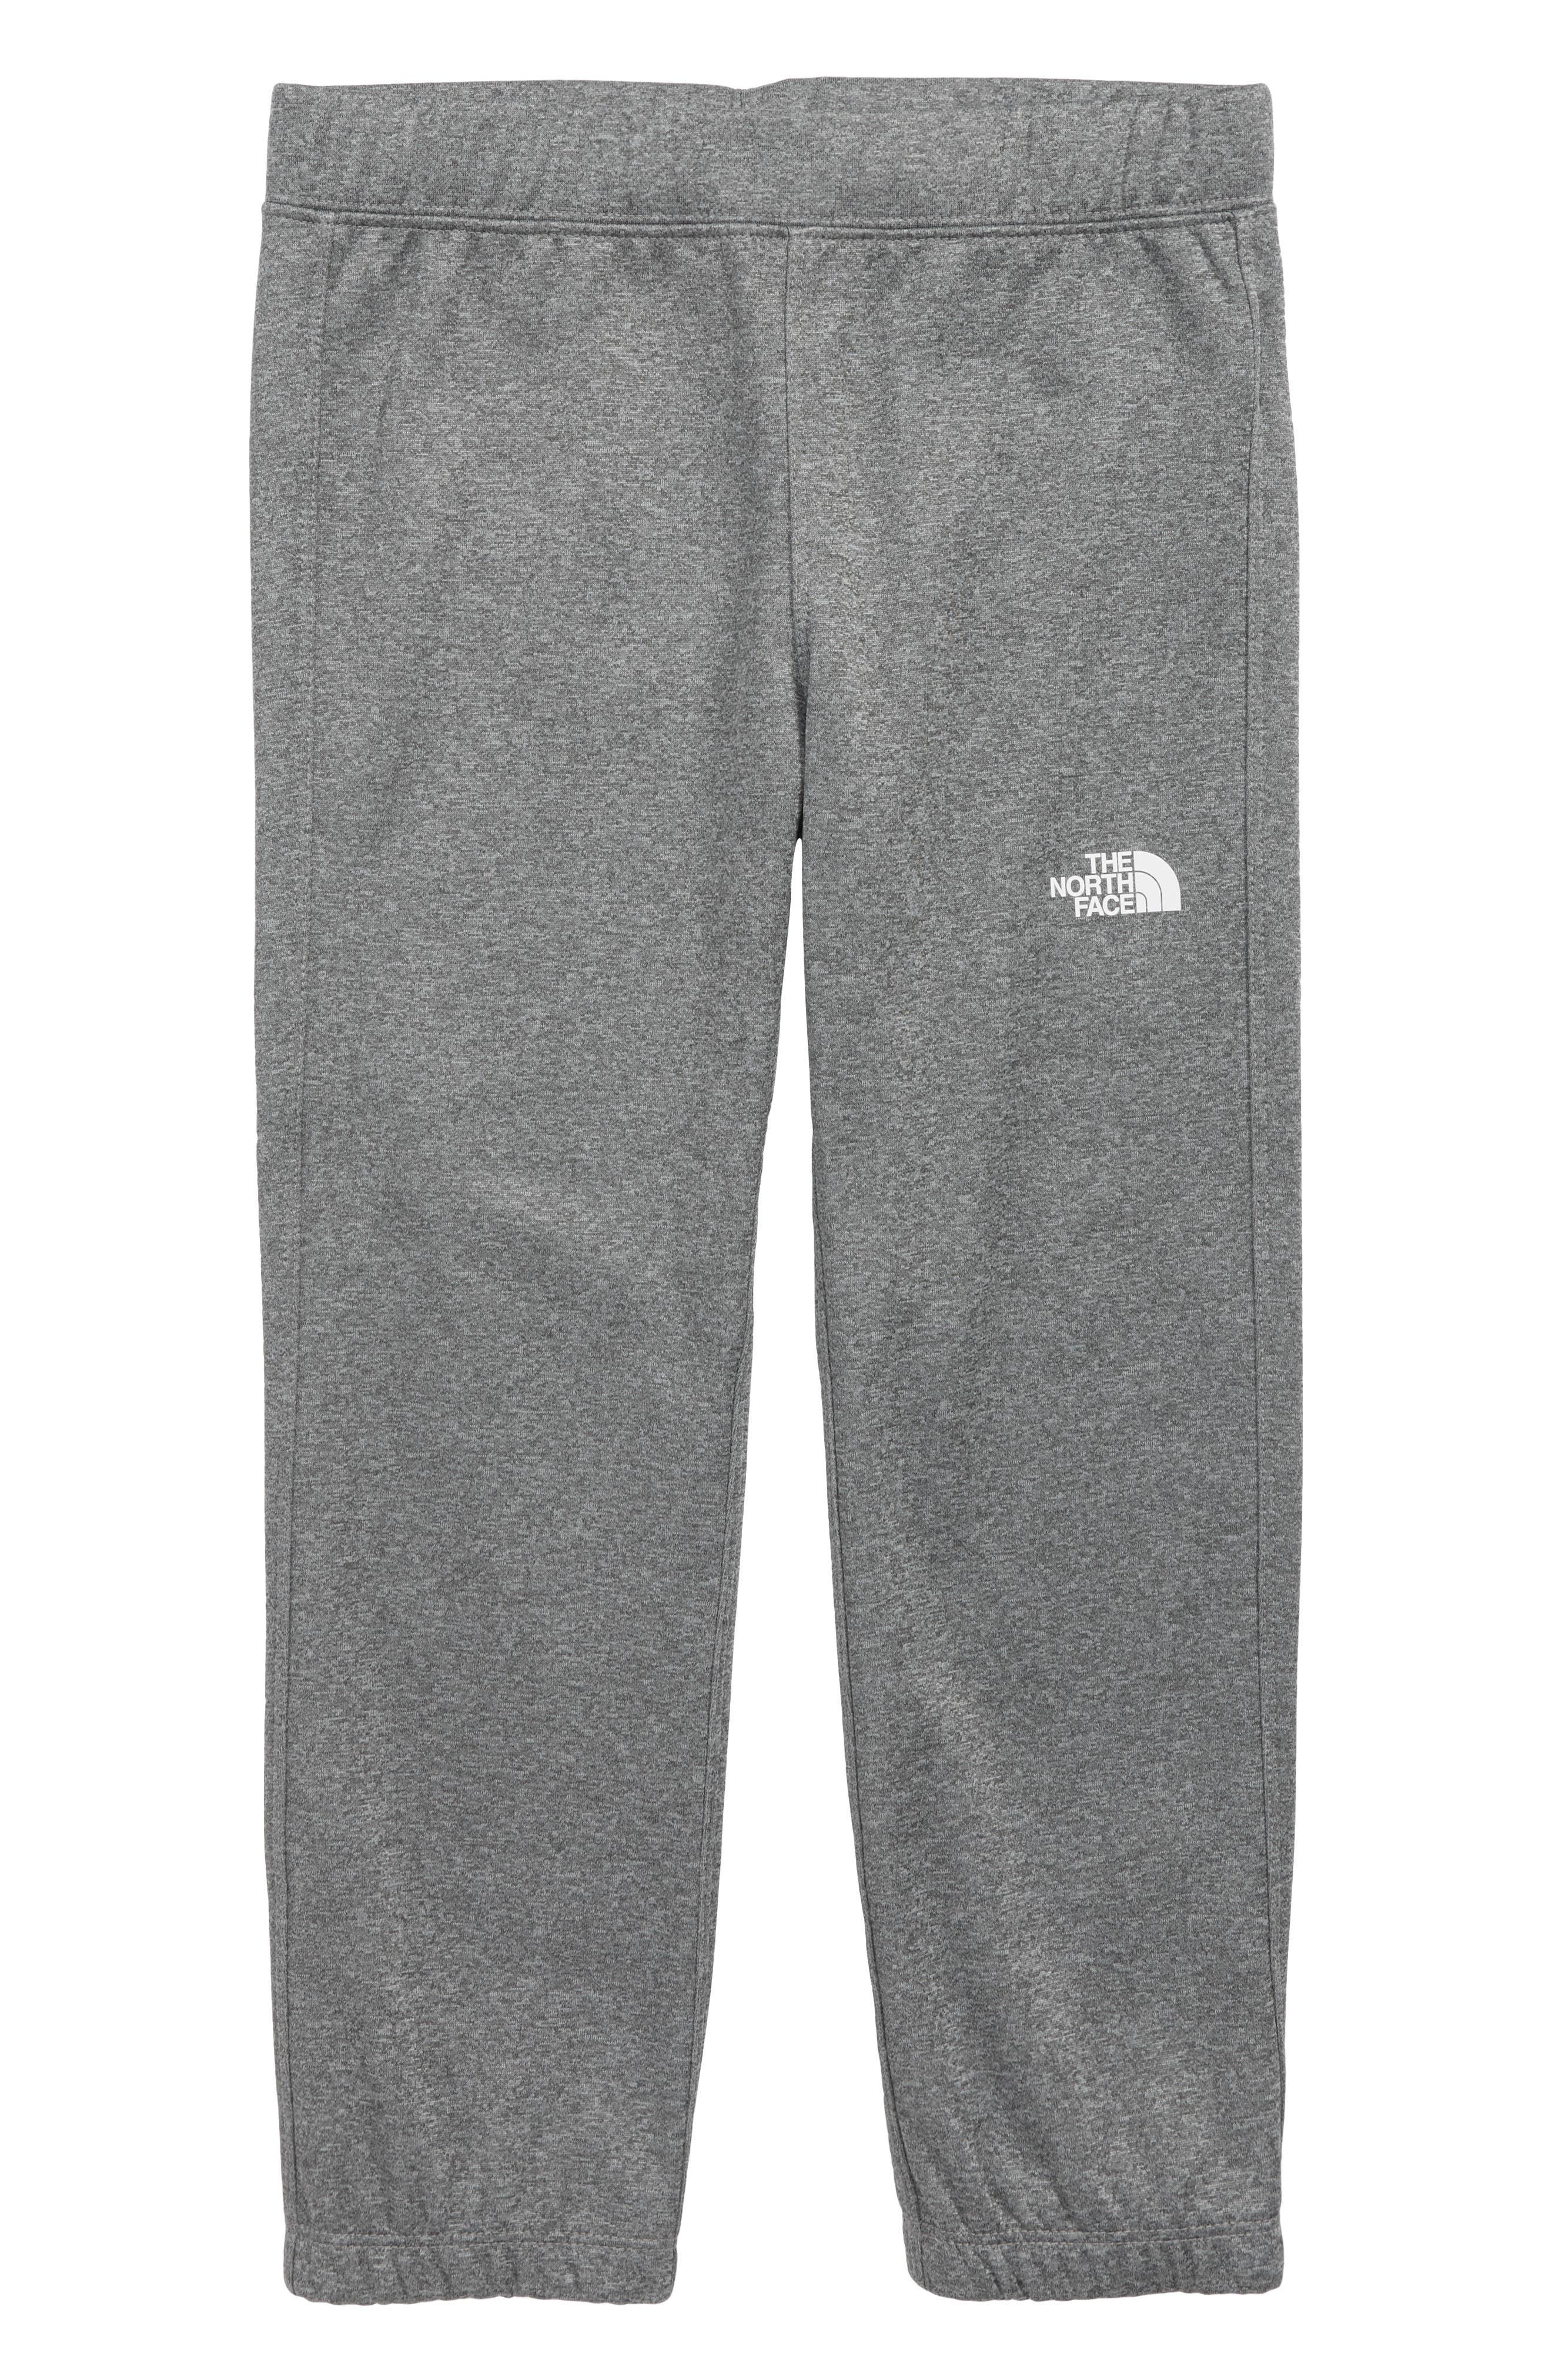 THE NORTH FACE Surgent Sweatpants, Main, color, TNF MEDIUM GREY HEATHER